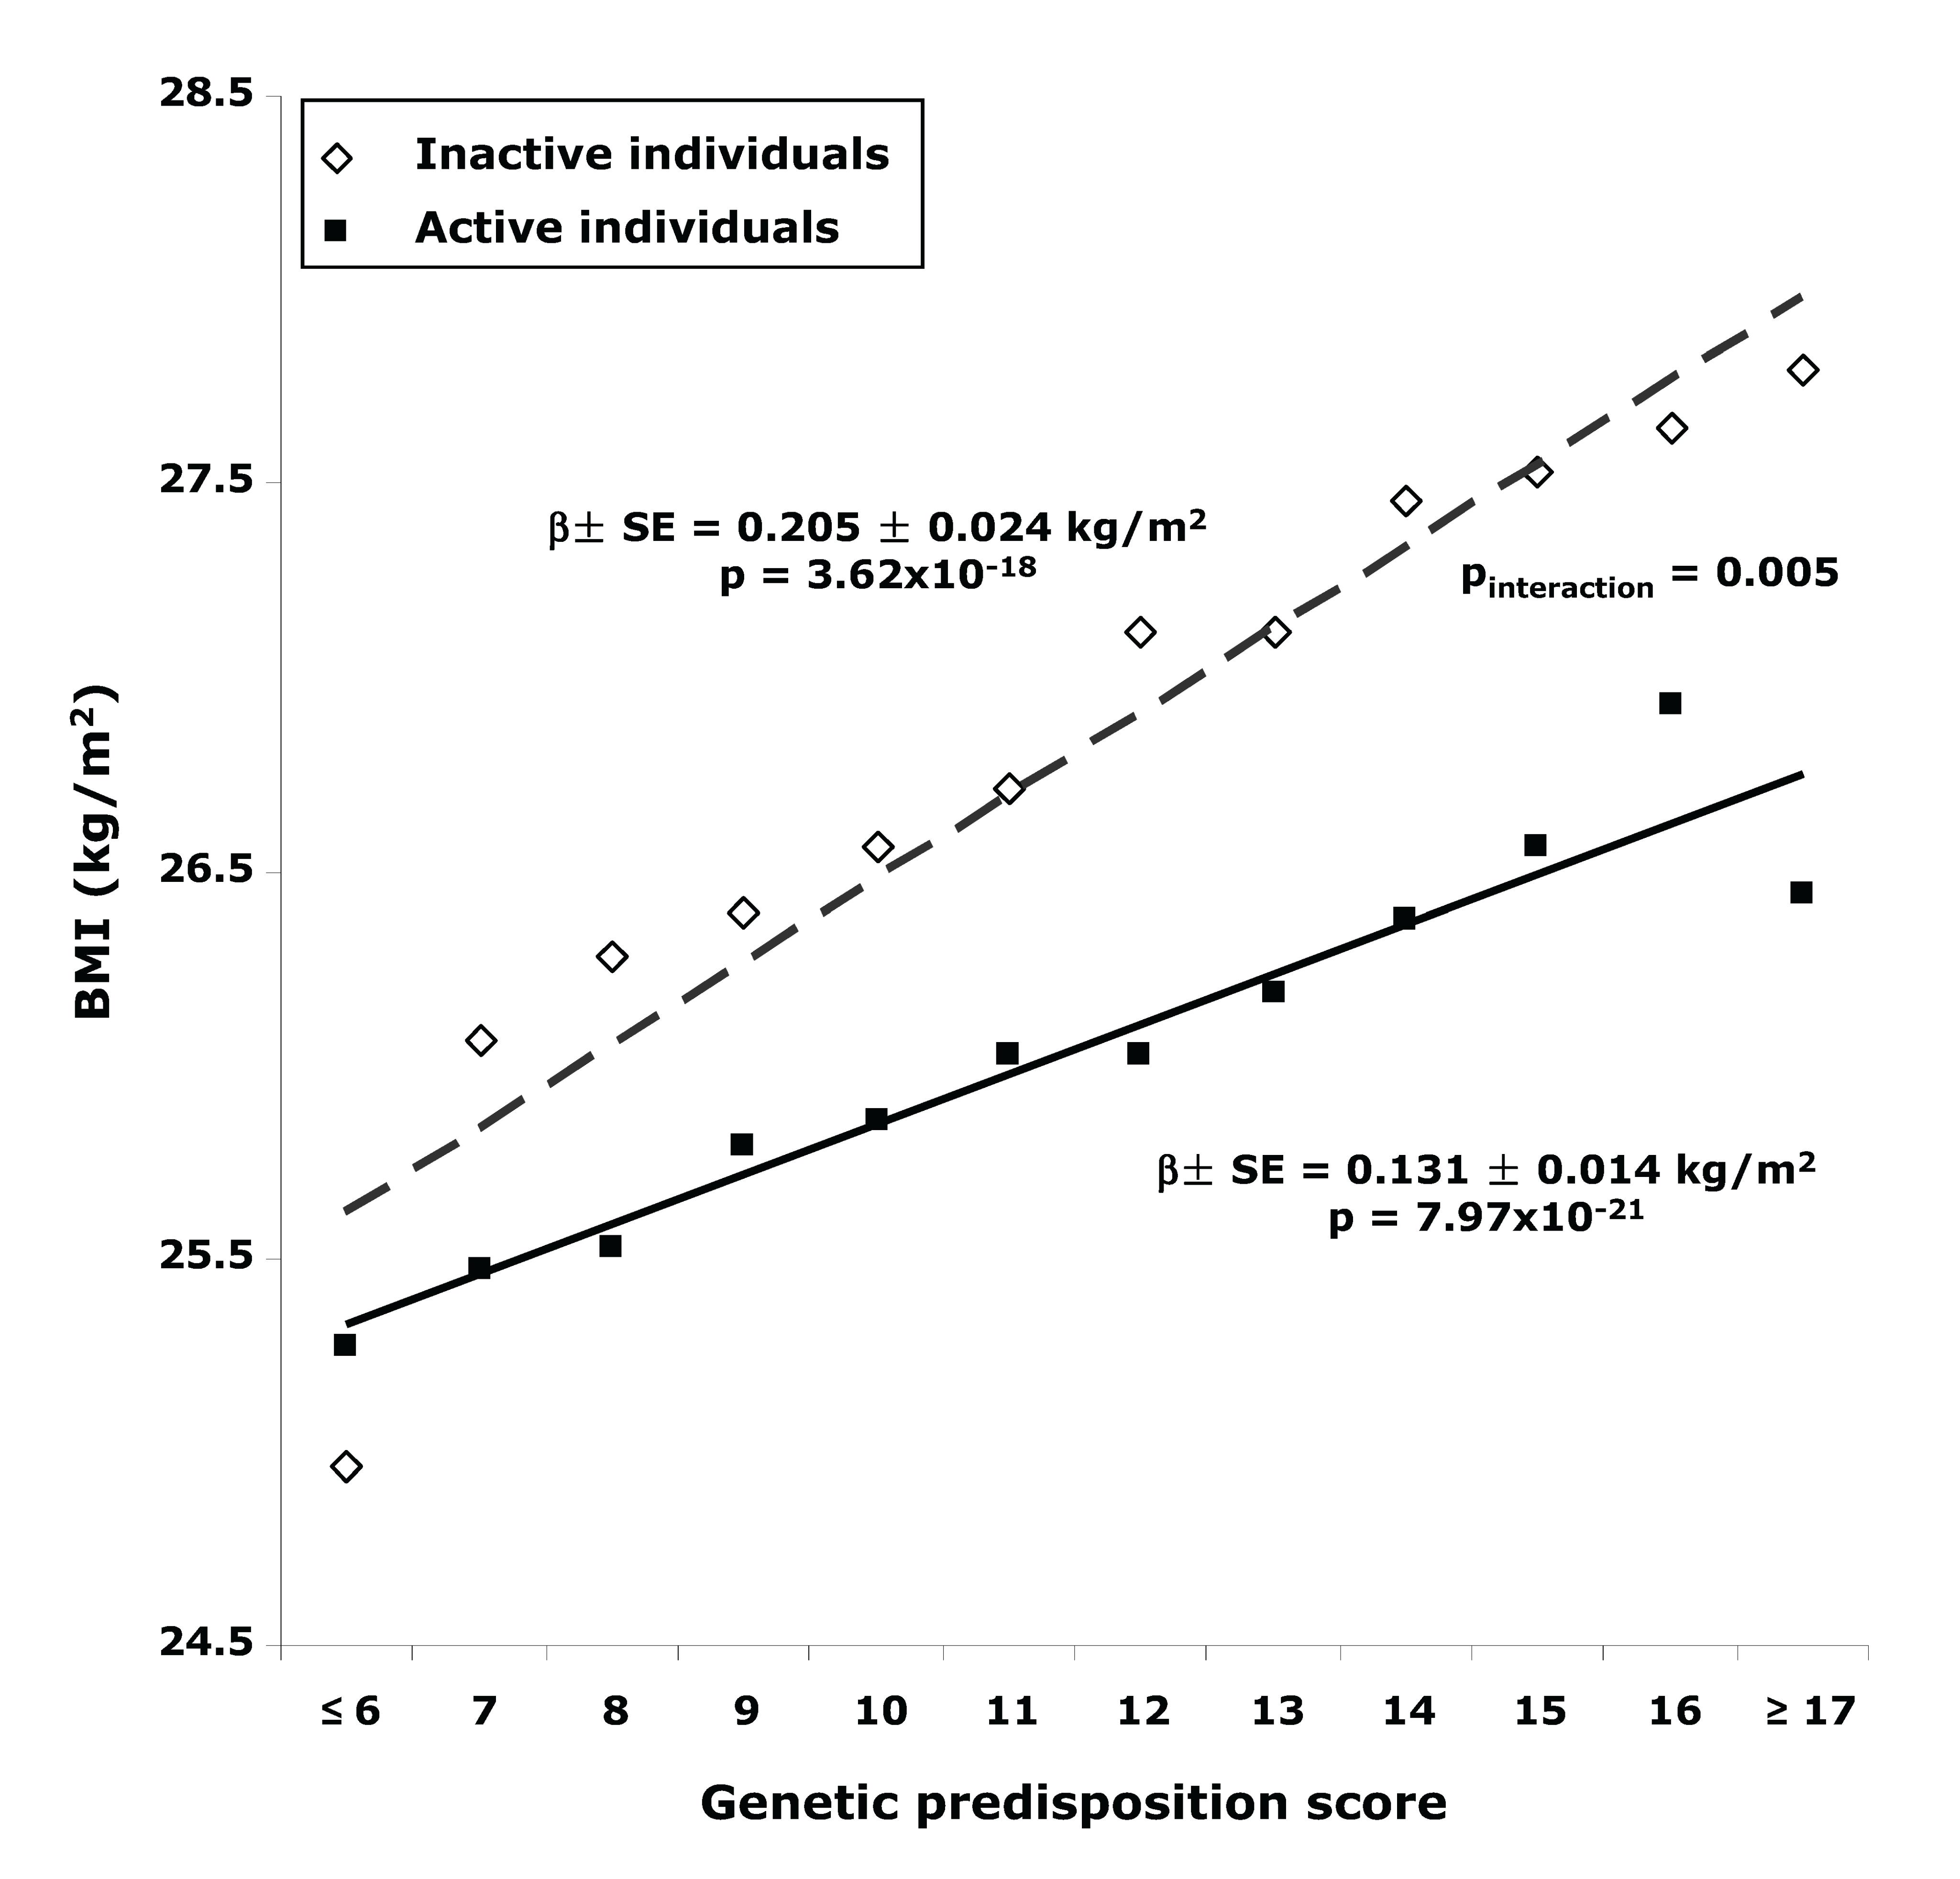 BMI with different genetic predisposition scores in inactive versus active individuals.